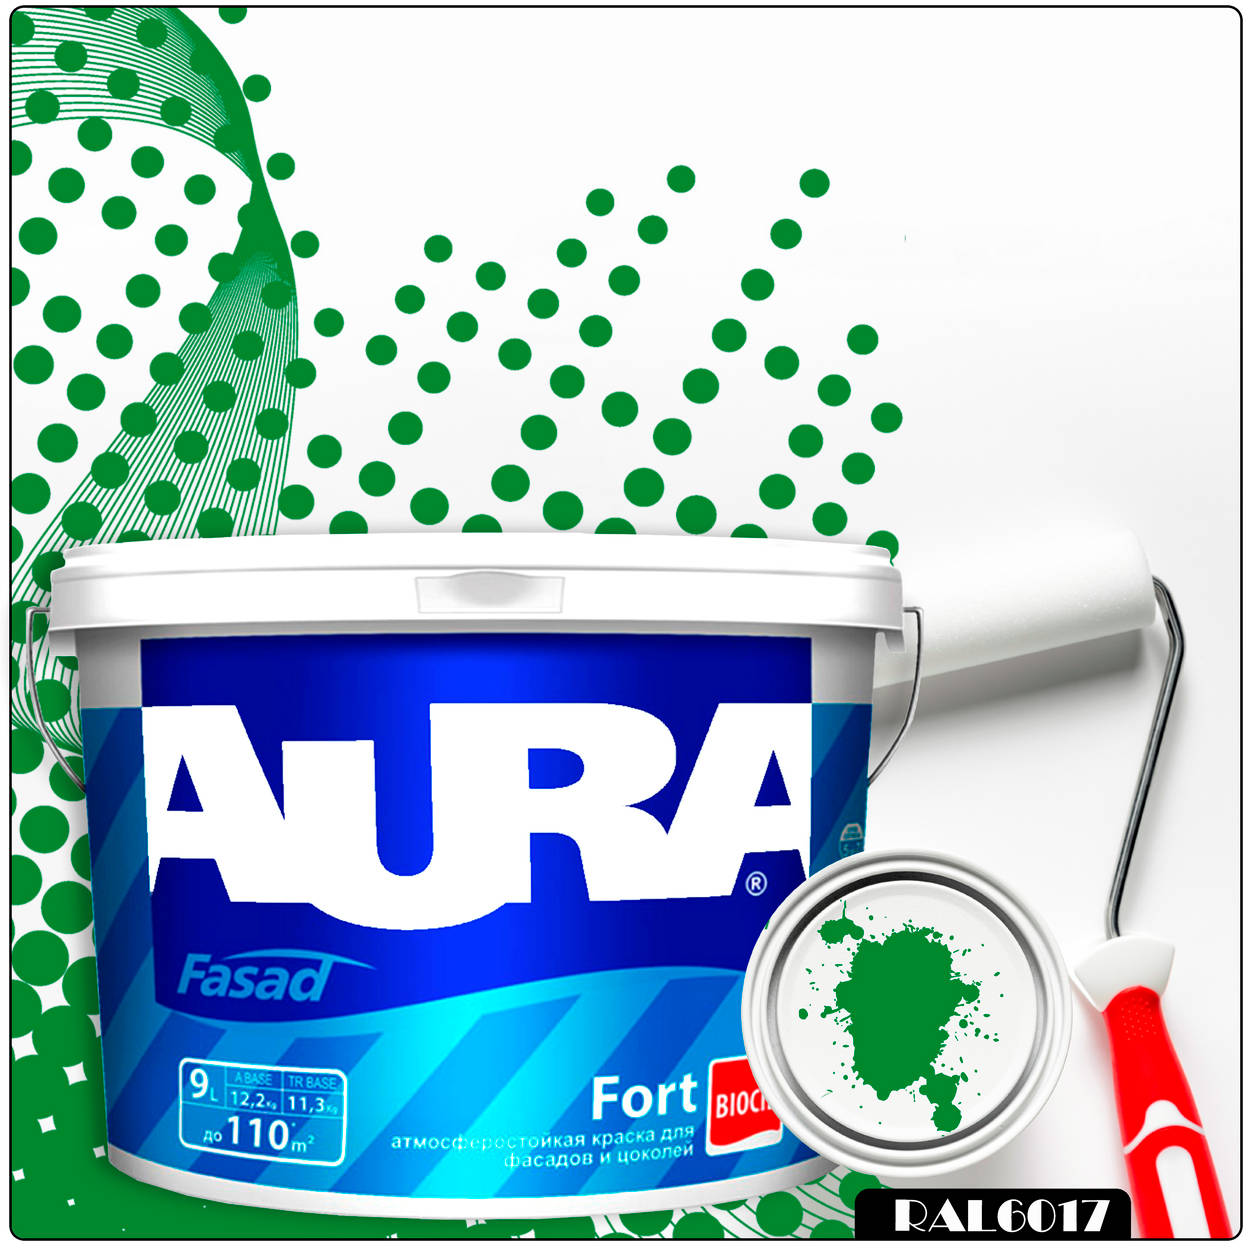 Фото 18 - Краска Aura Fasad Fort, RAL 6017 Майская зелень, латексная, матовая, для фасада и цоколей, 9л, Аура.